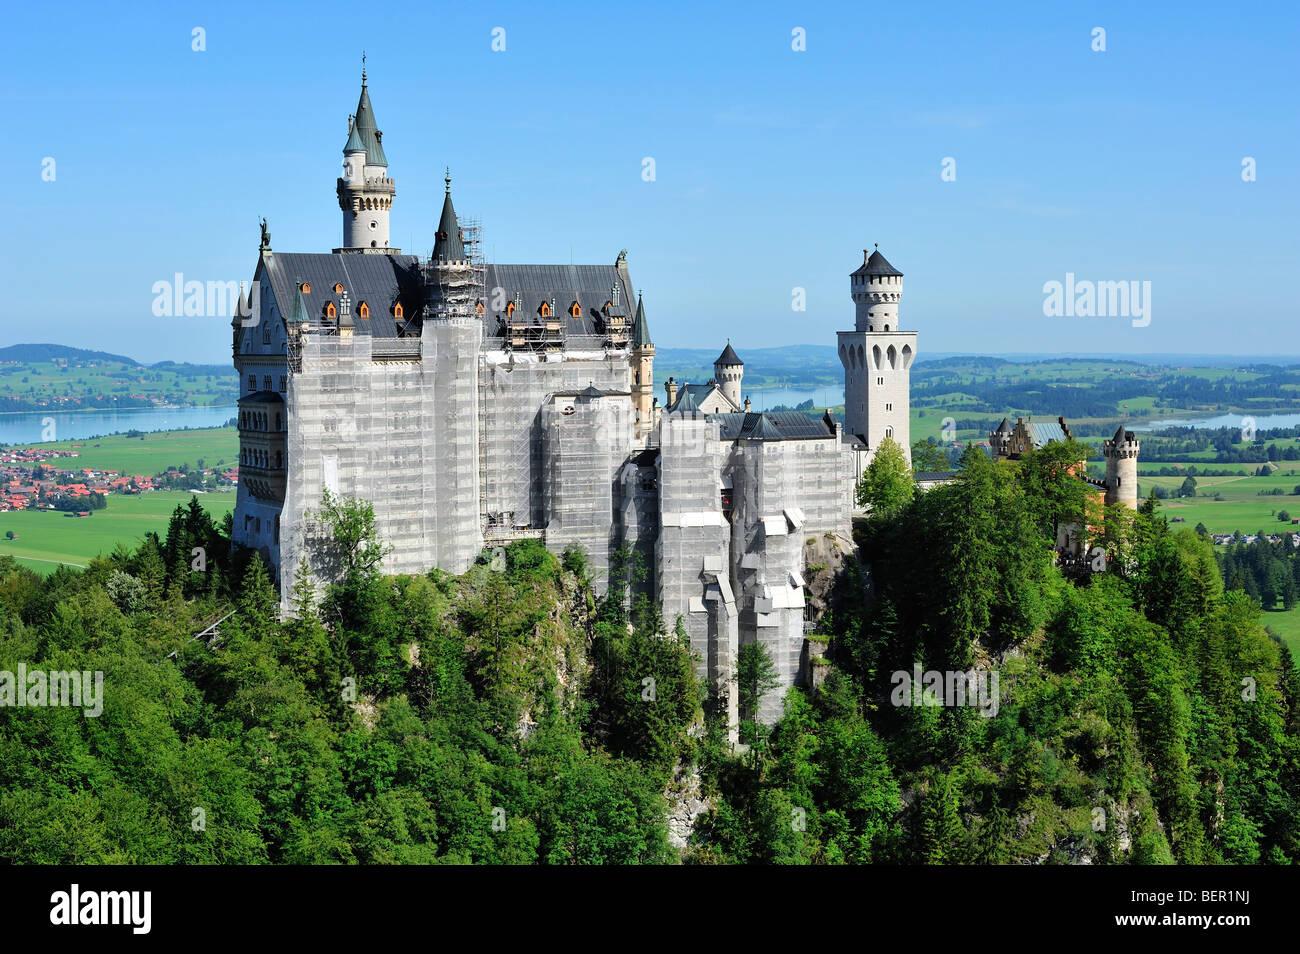 Neuschwanstein Castle, District of Ostallgäu, Bavaria, Germany Stock Photo